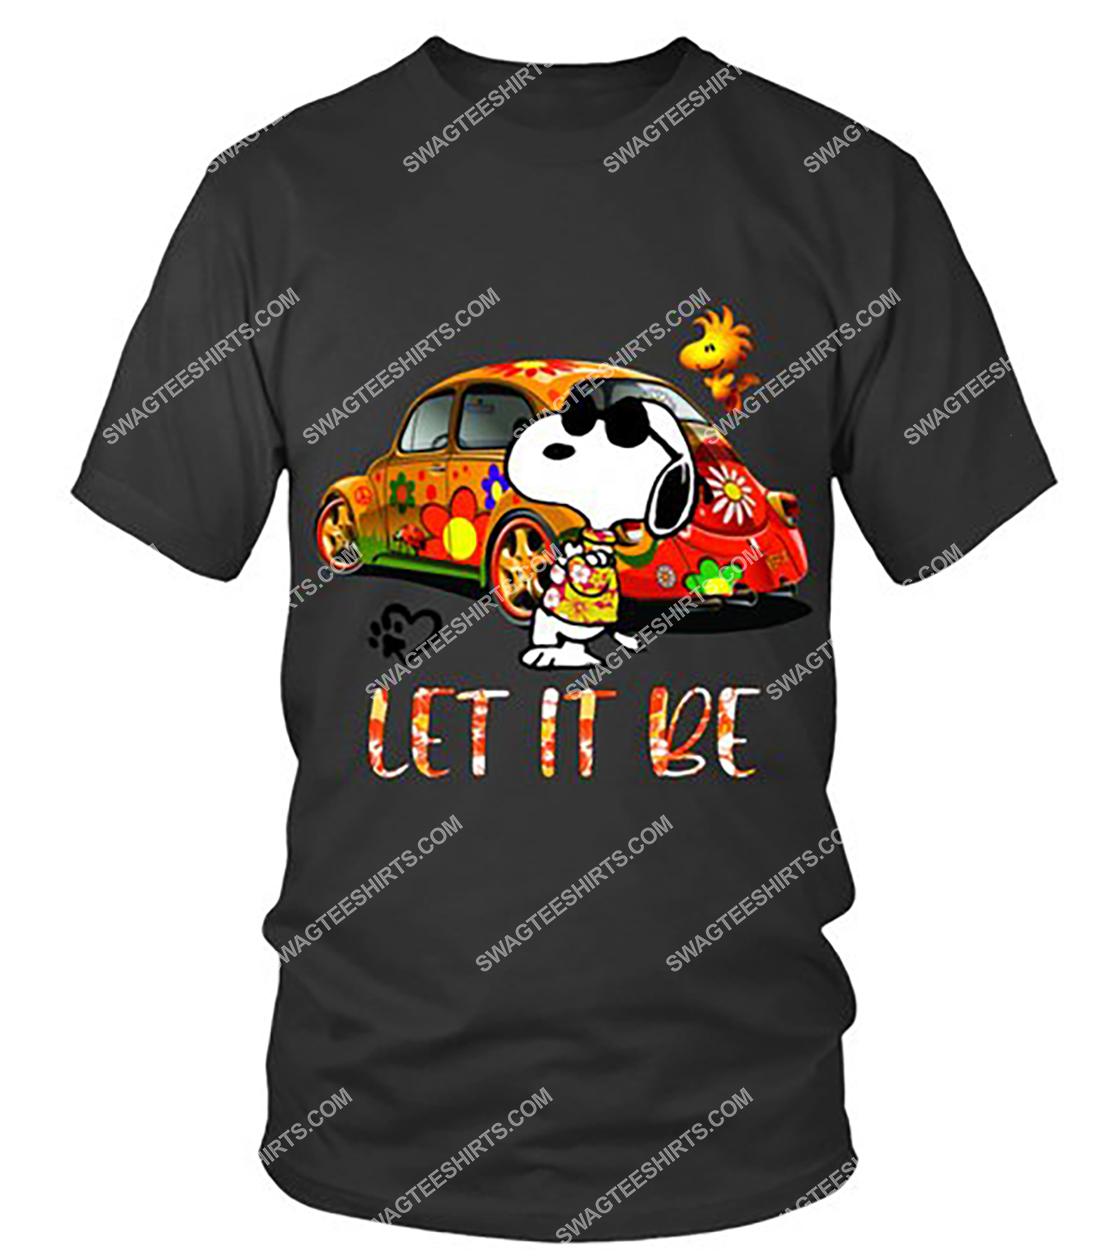 charlie brown snoopy let it be tshirt - Copy 1